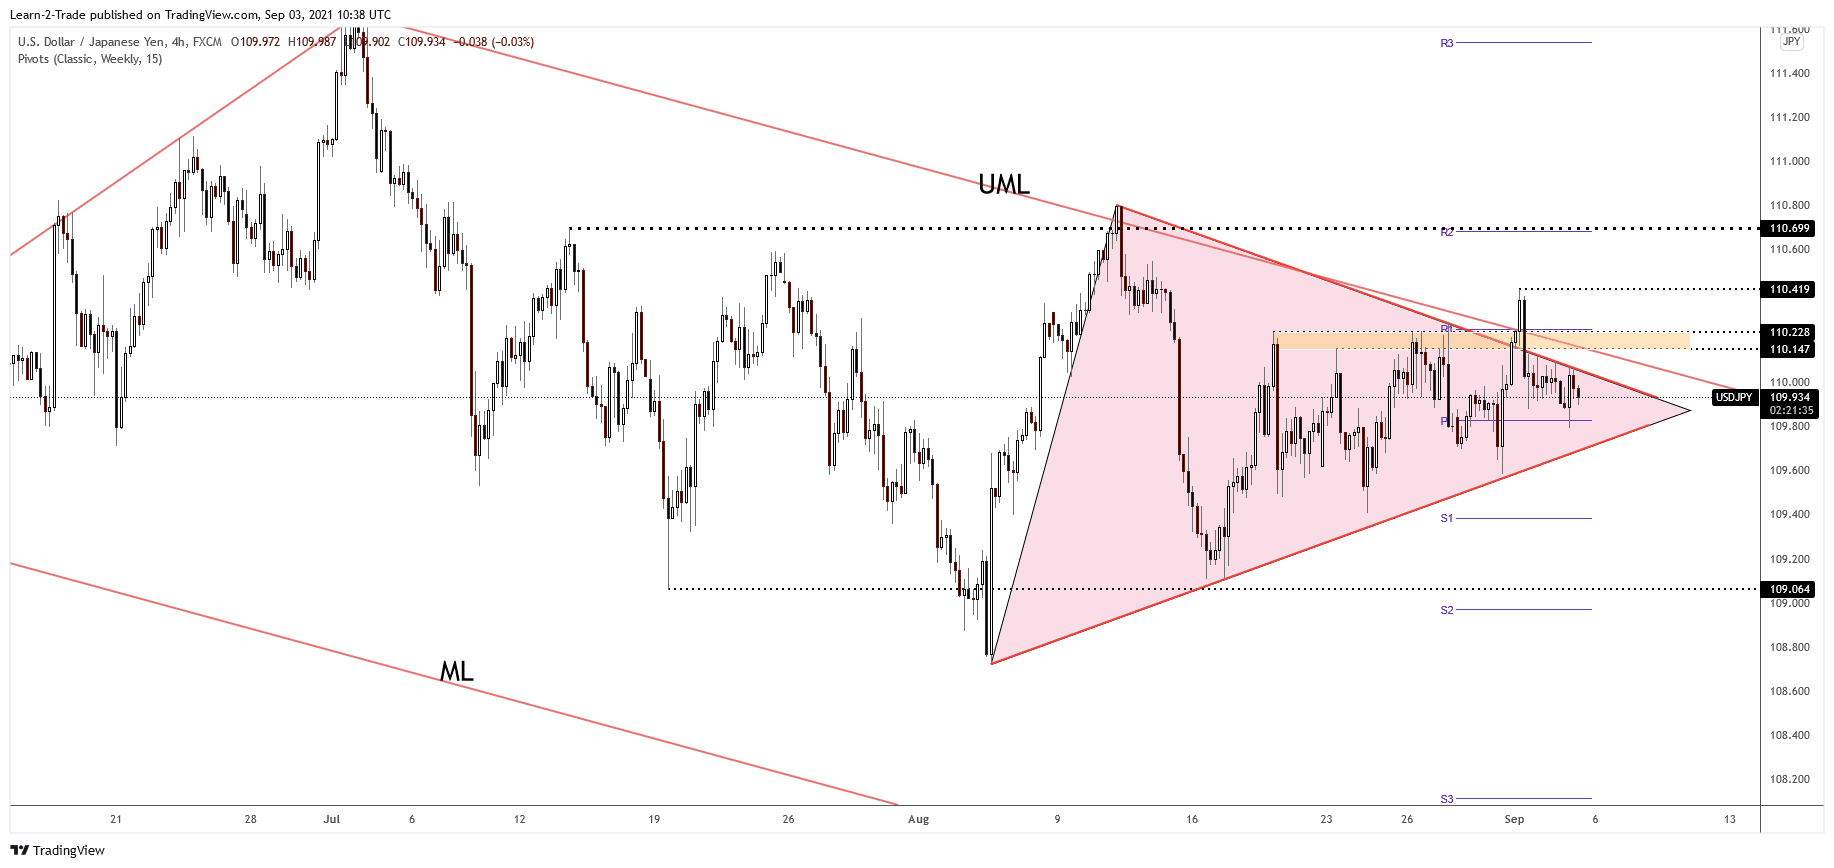 USD/JPY 4-hour price chart analysis